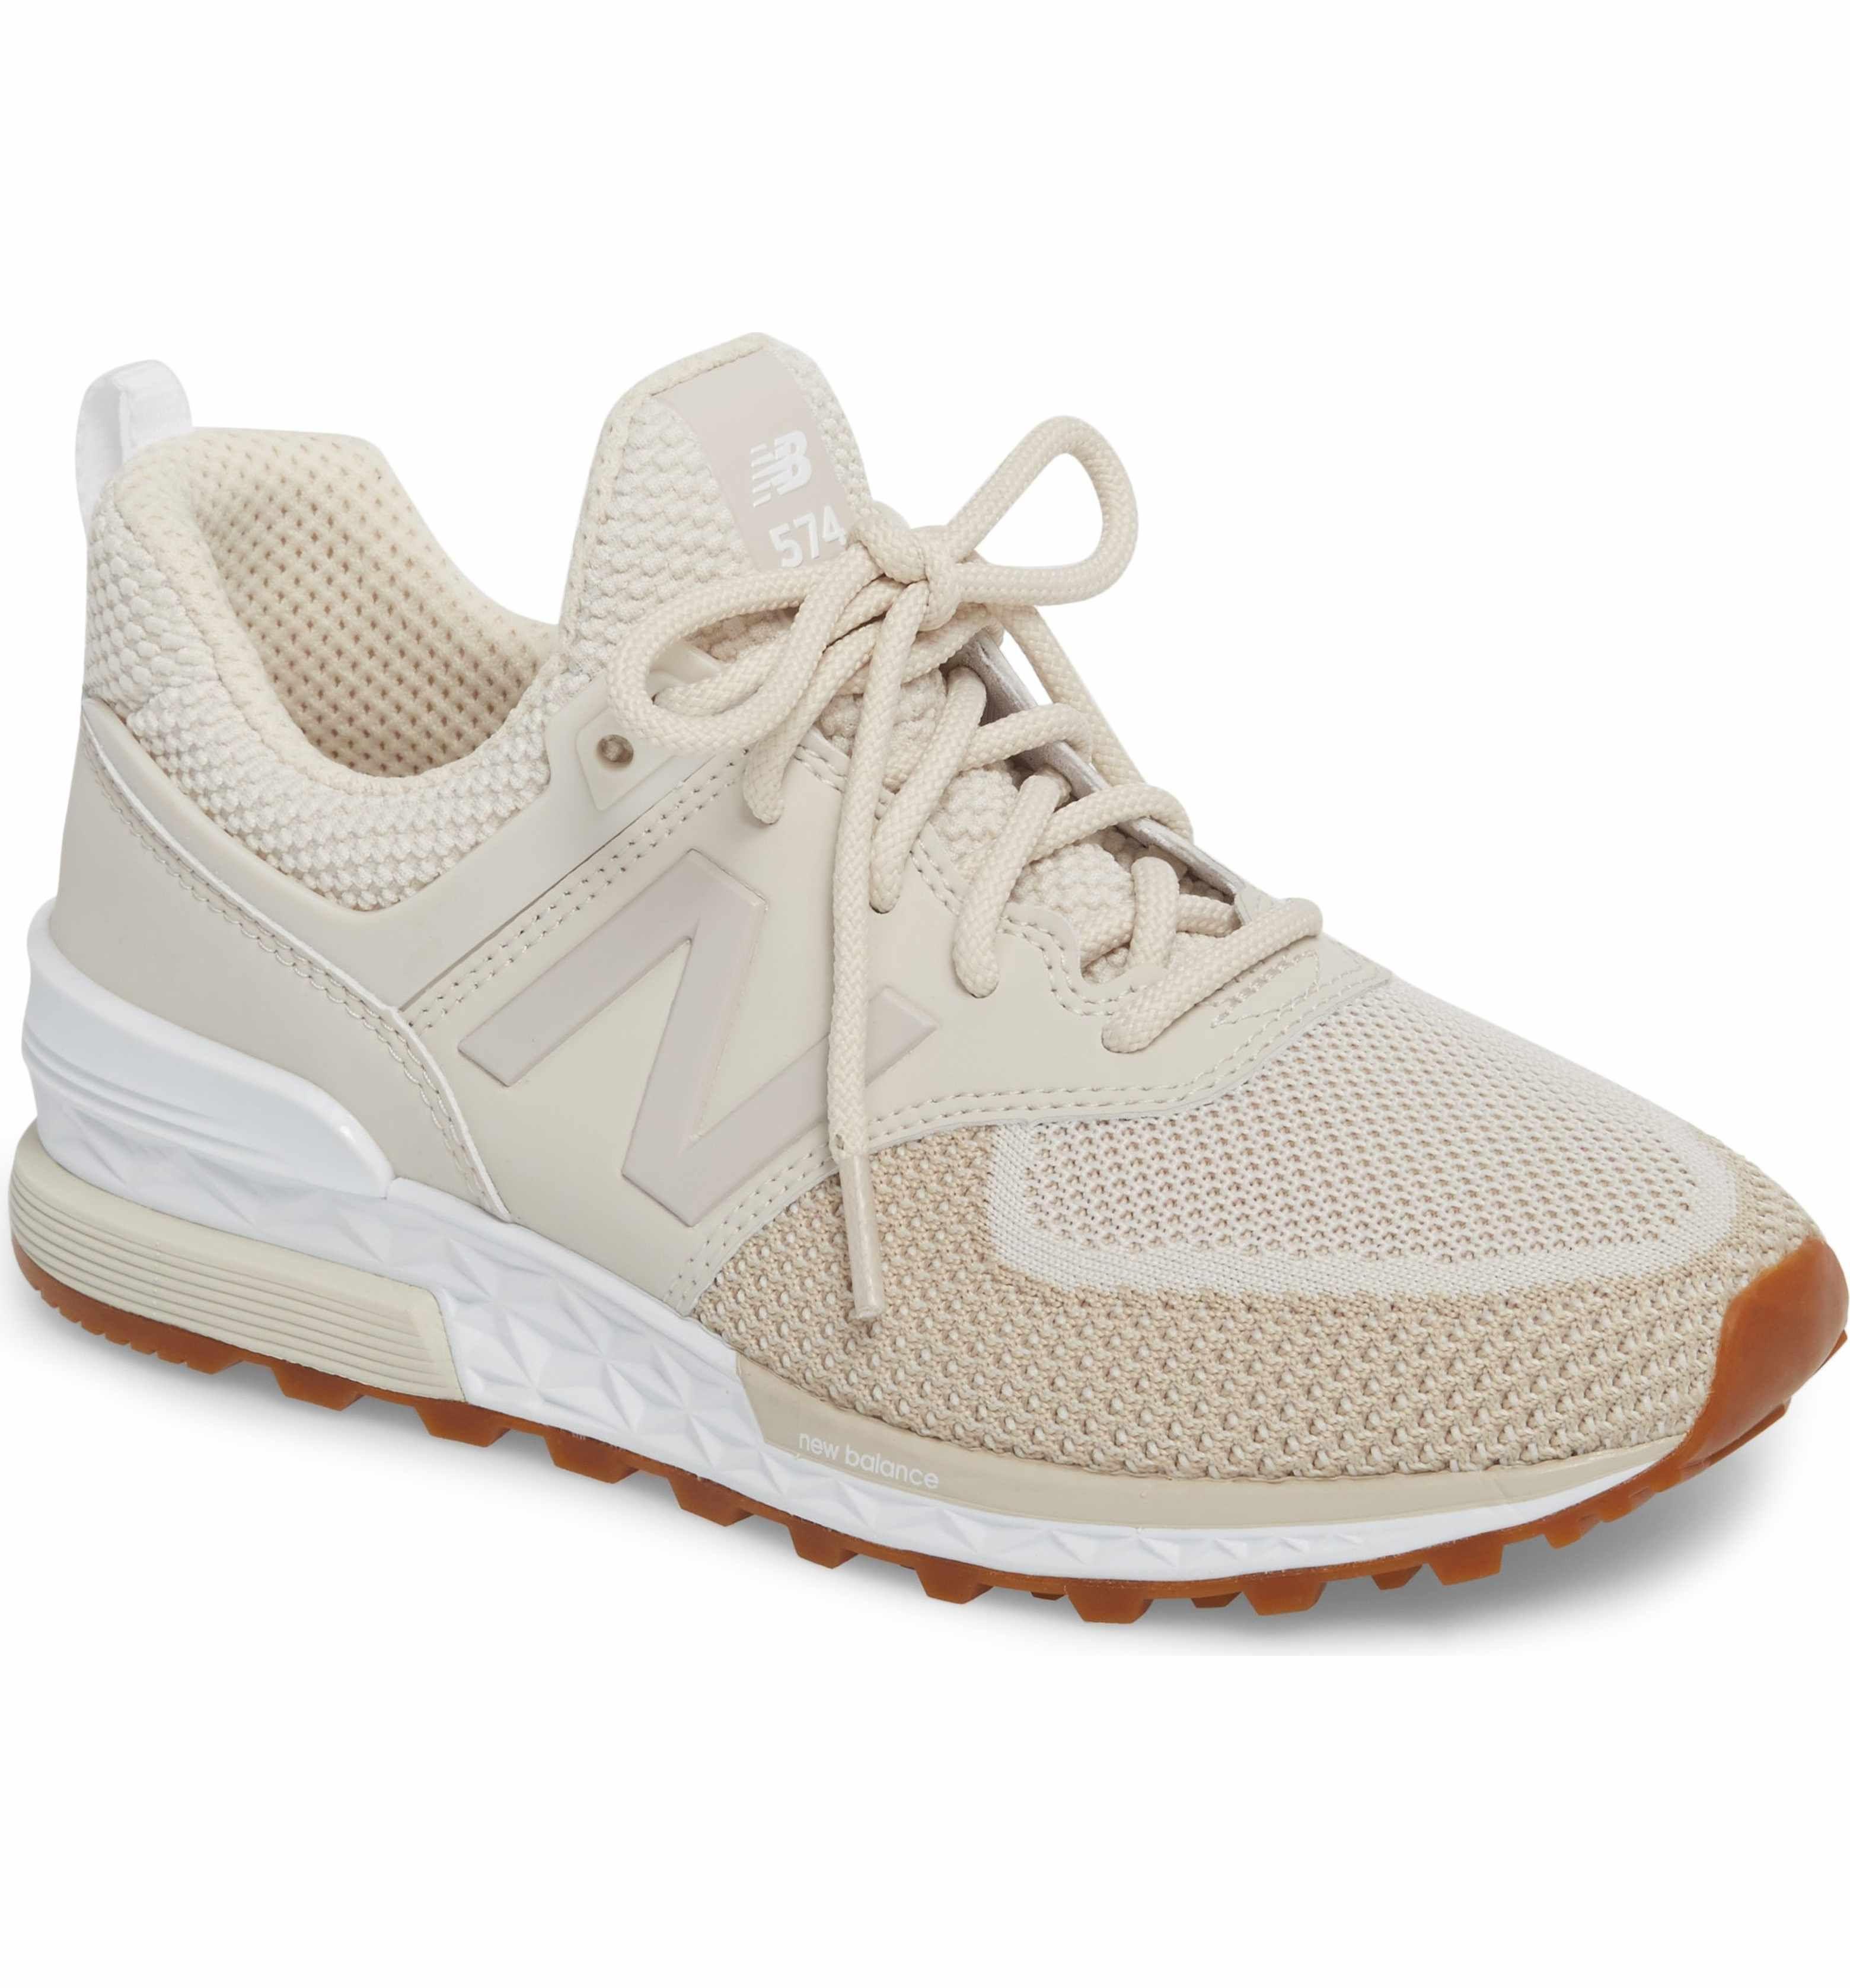 New Balance 574 Sport Sneaker (Women